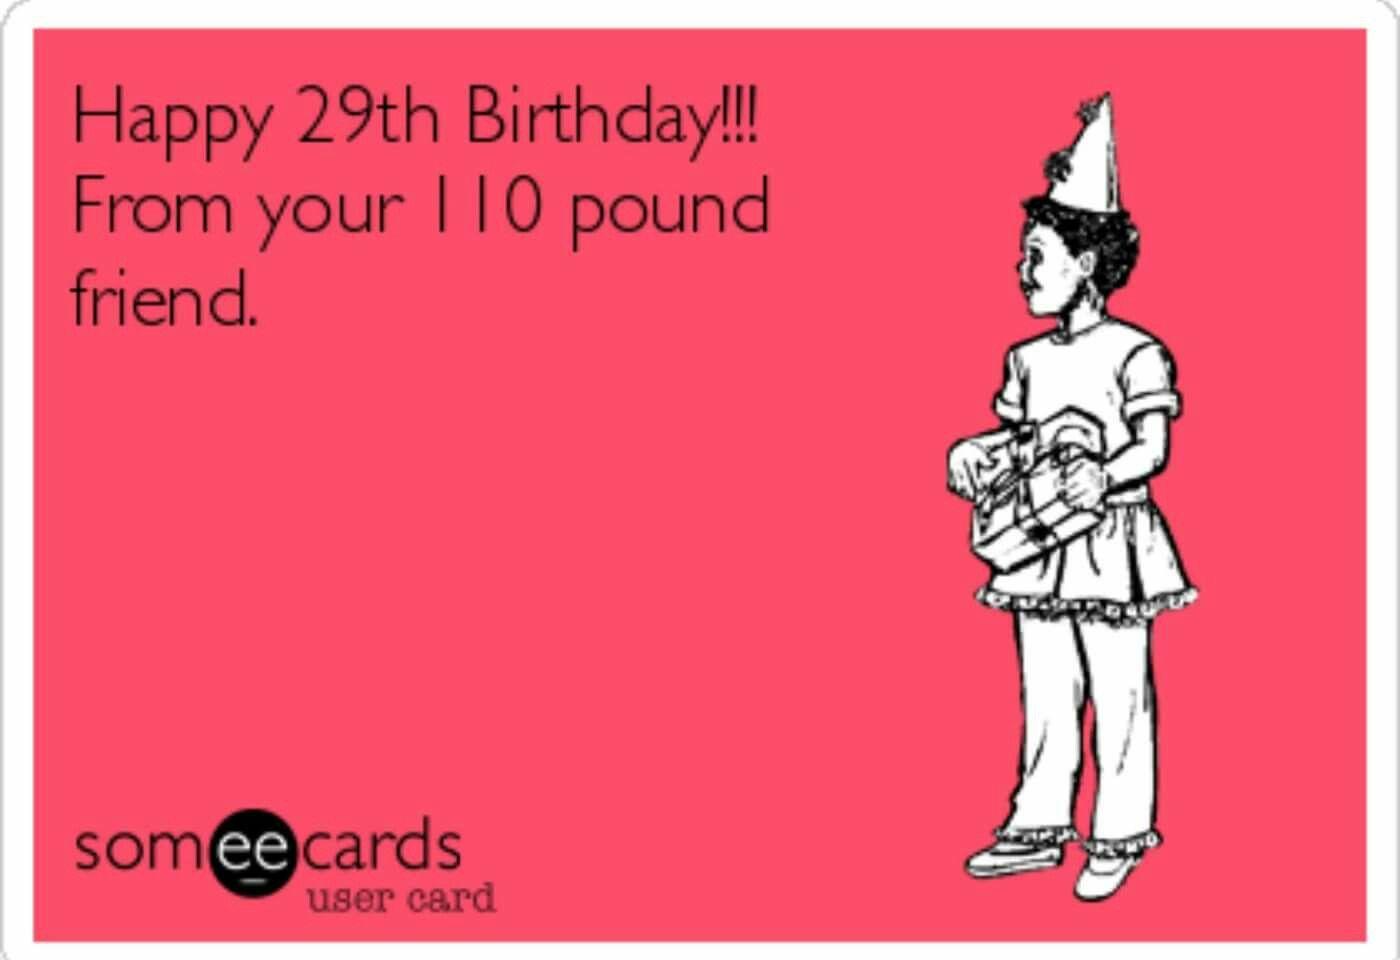 Pin By Lisa Uva On The Laughing Corner Happy 29th Birthday Funny Birthday Meme Birthday Humor